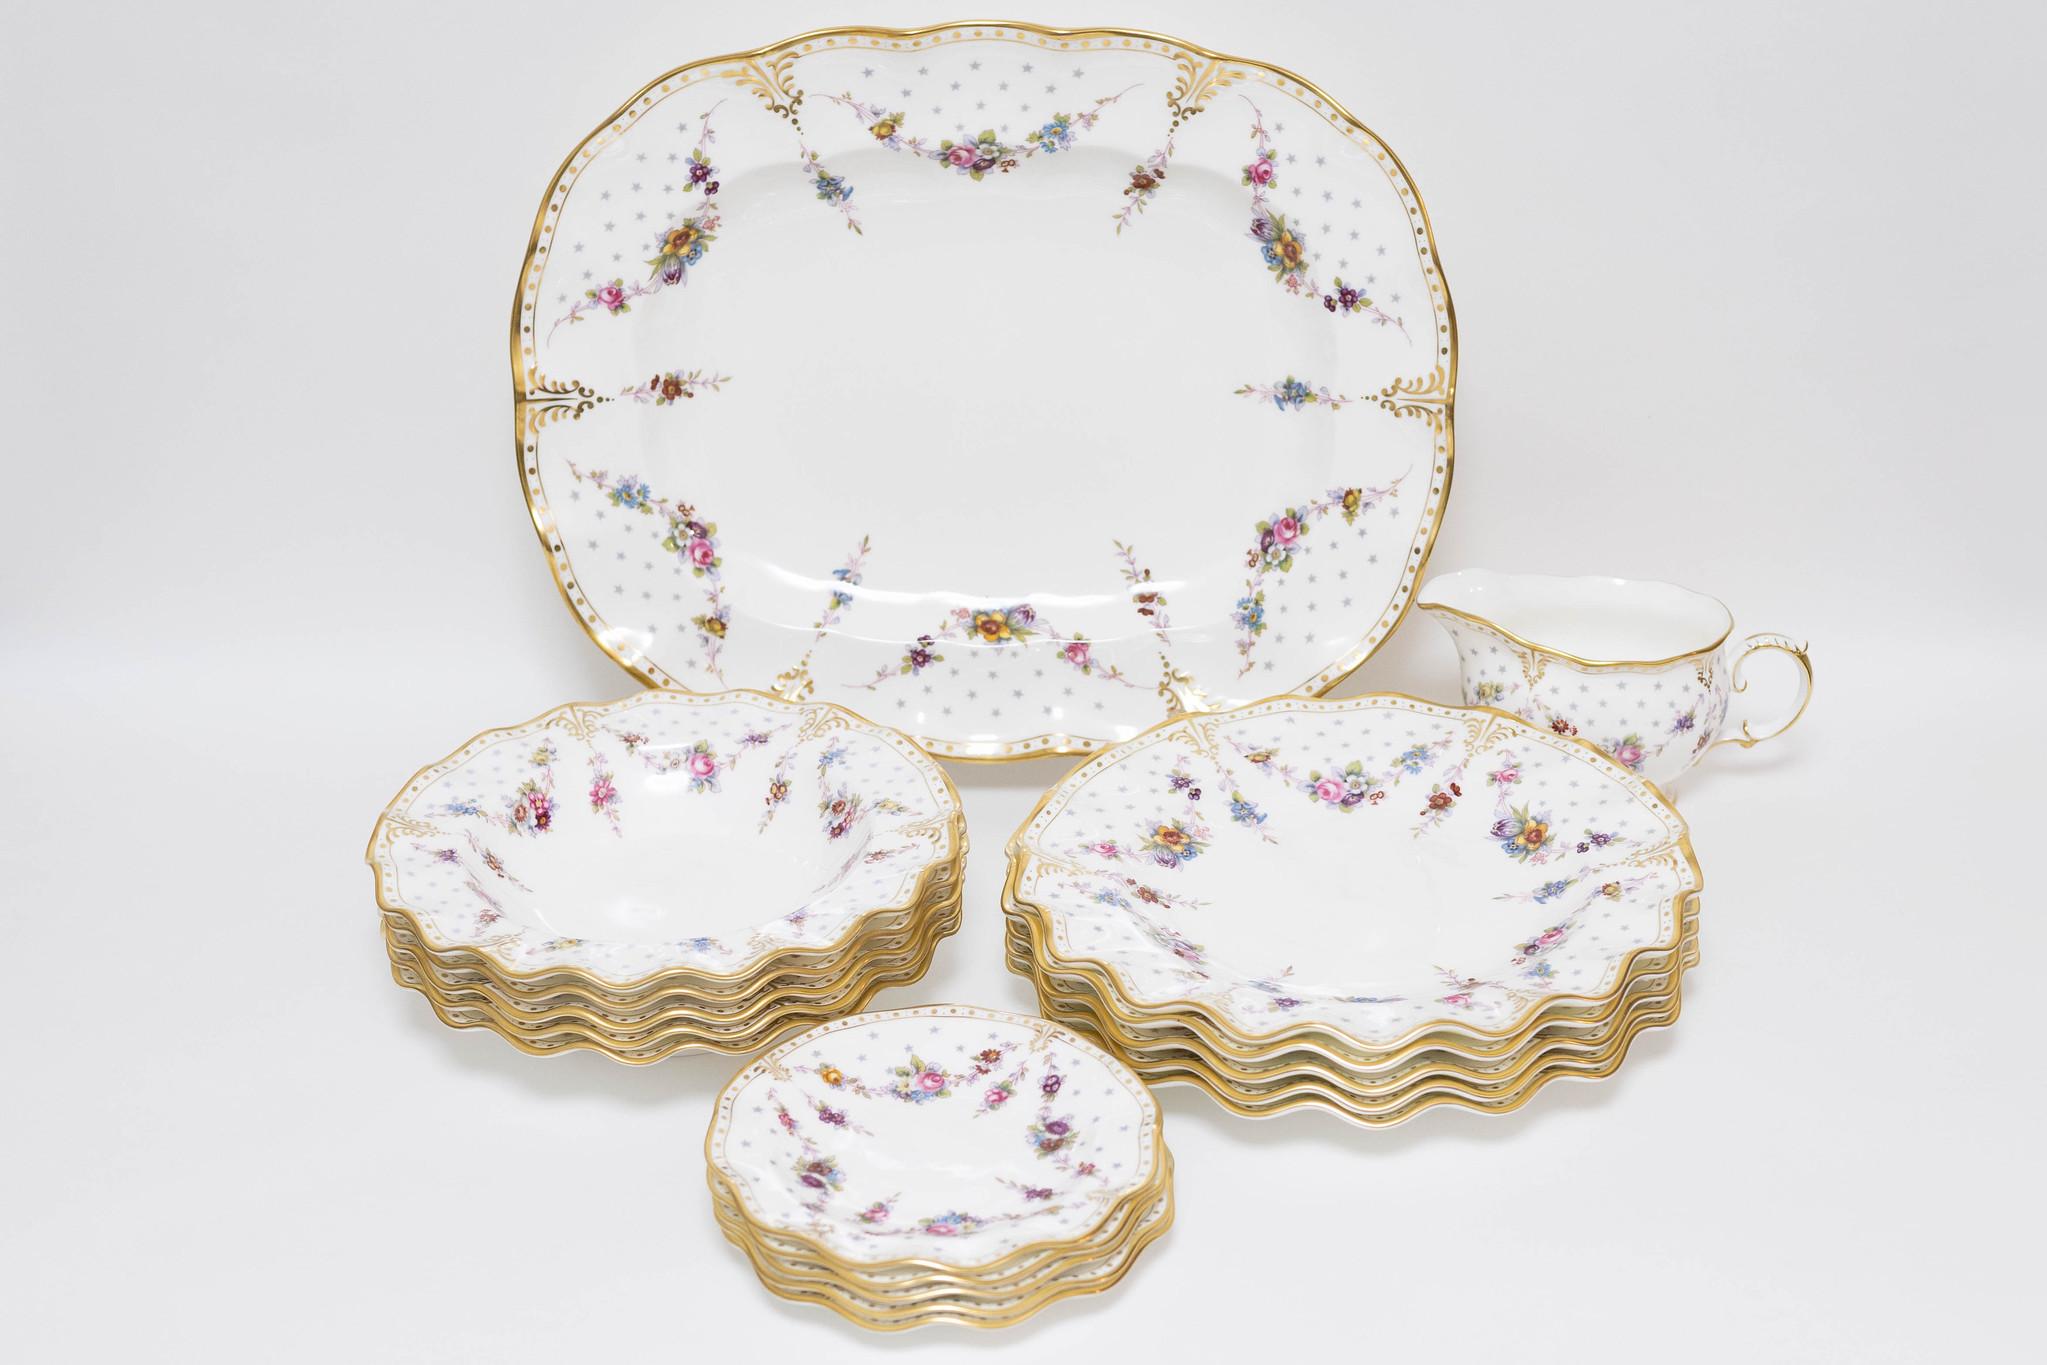 Royal Antoinette / Royal Crown Derby